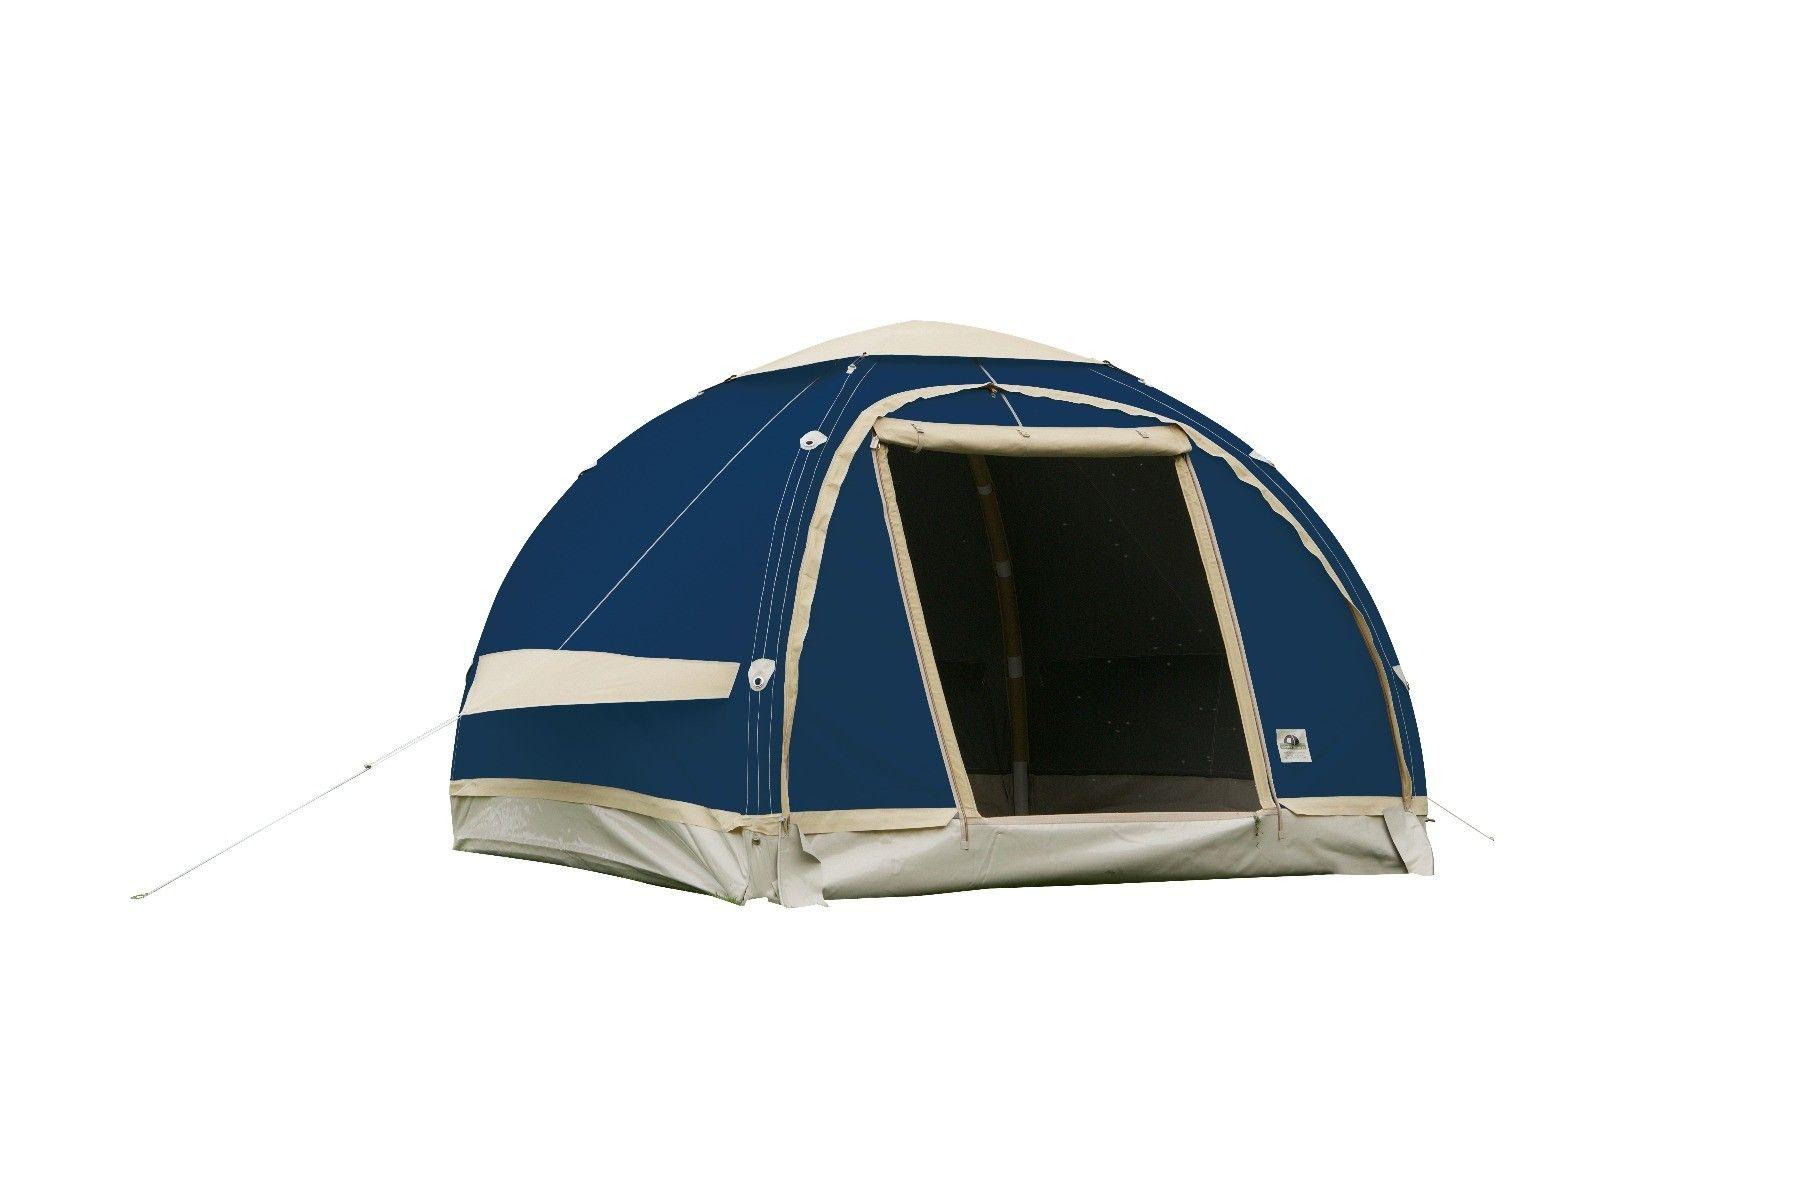 Karsten Air tent 220